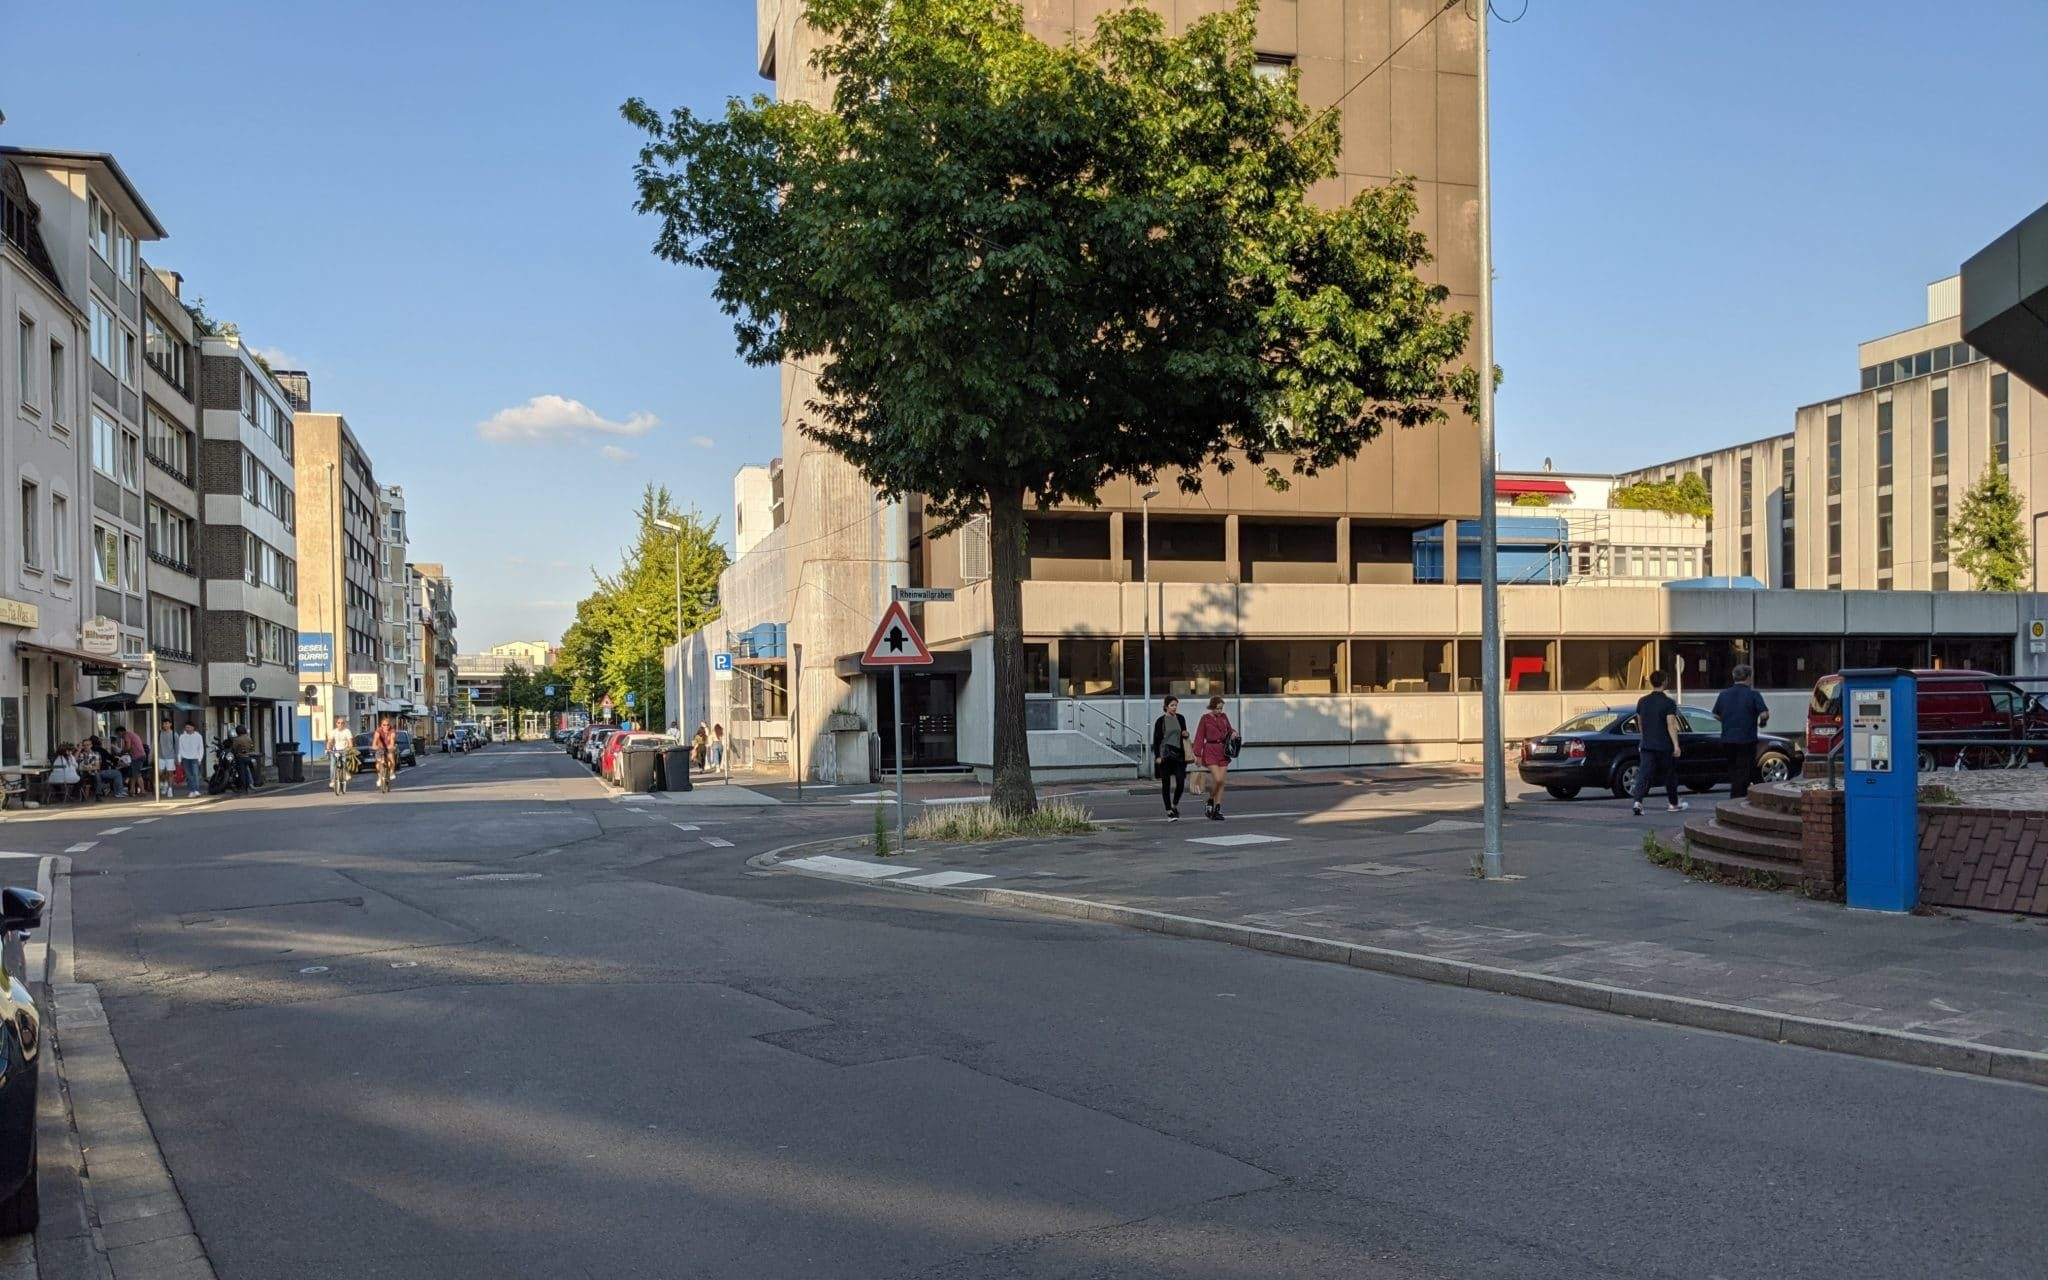 Verkehrsberuhigung in der Innenstadt